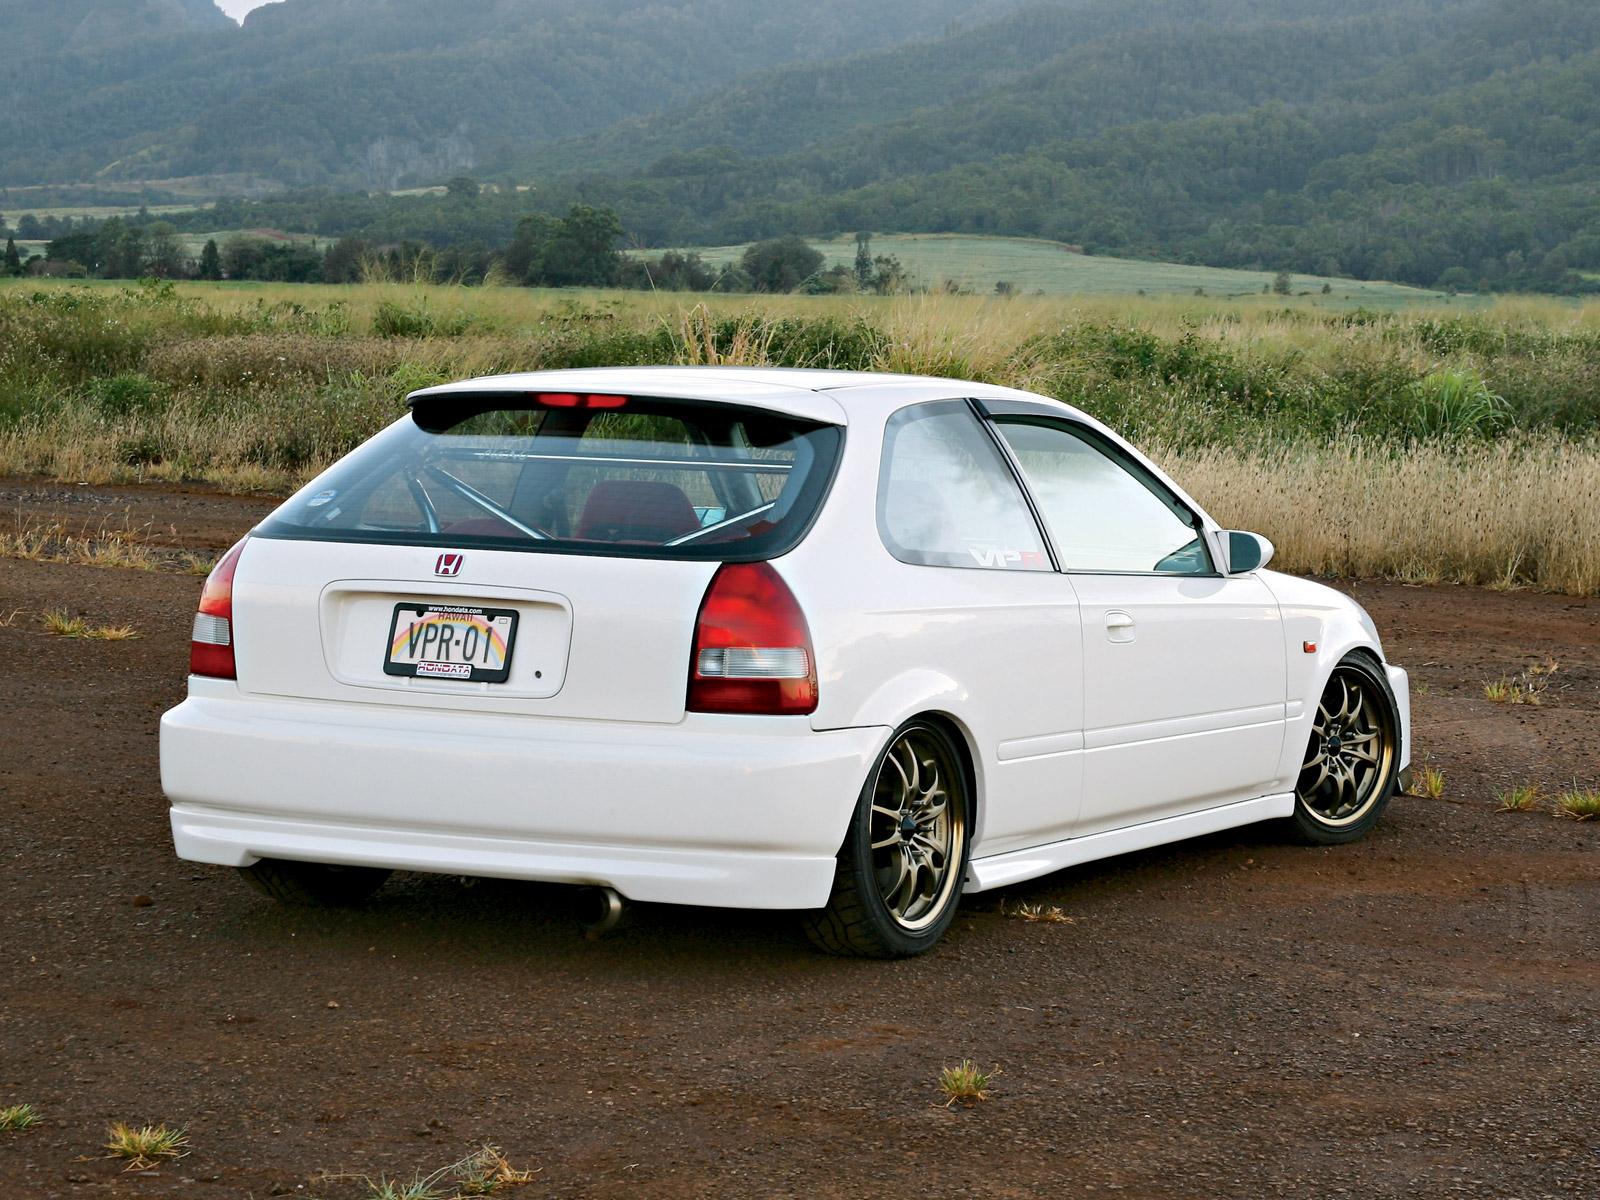 1996 Honda Civic Image 13